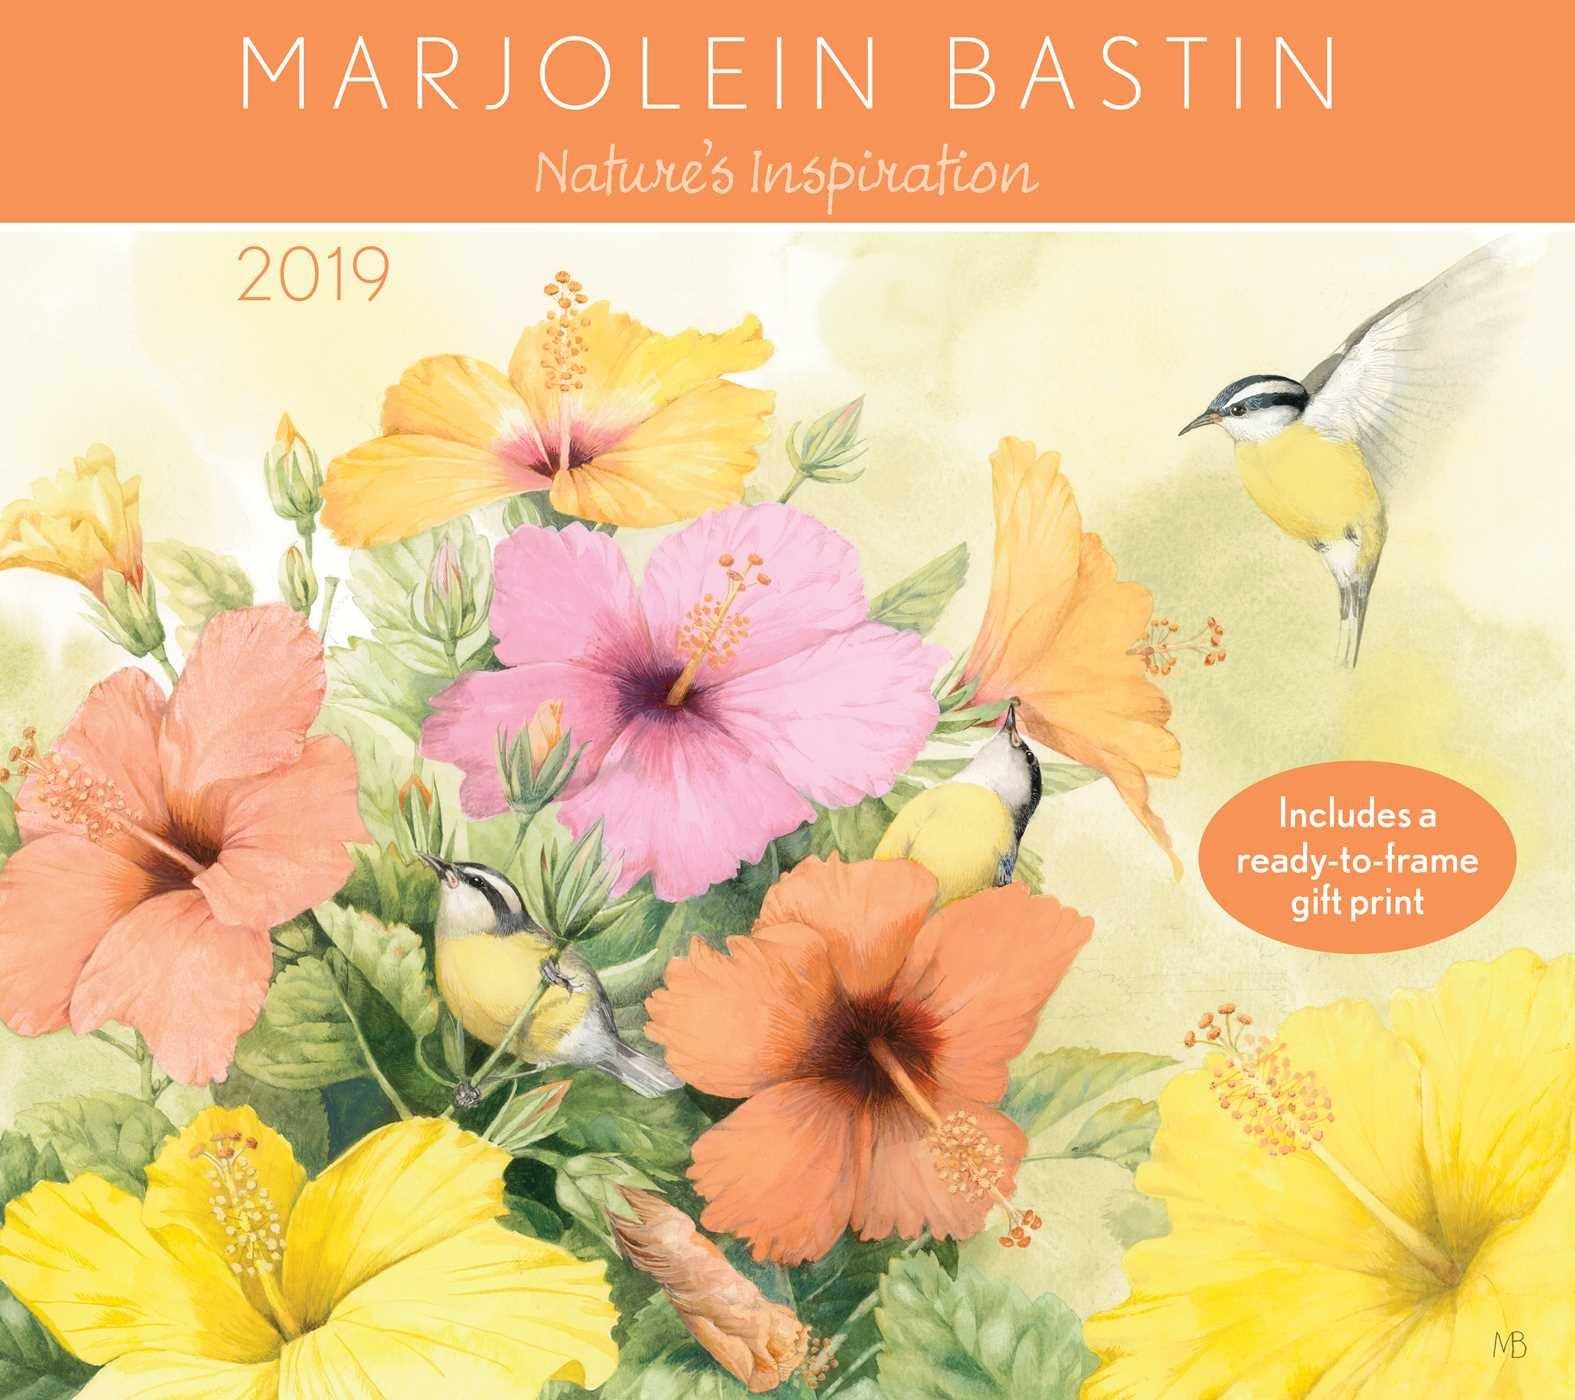 Amazon.com: Marjolein Bastin 2019 Deluxe Wall Calendar: Nature\'s ...